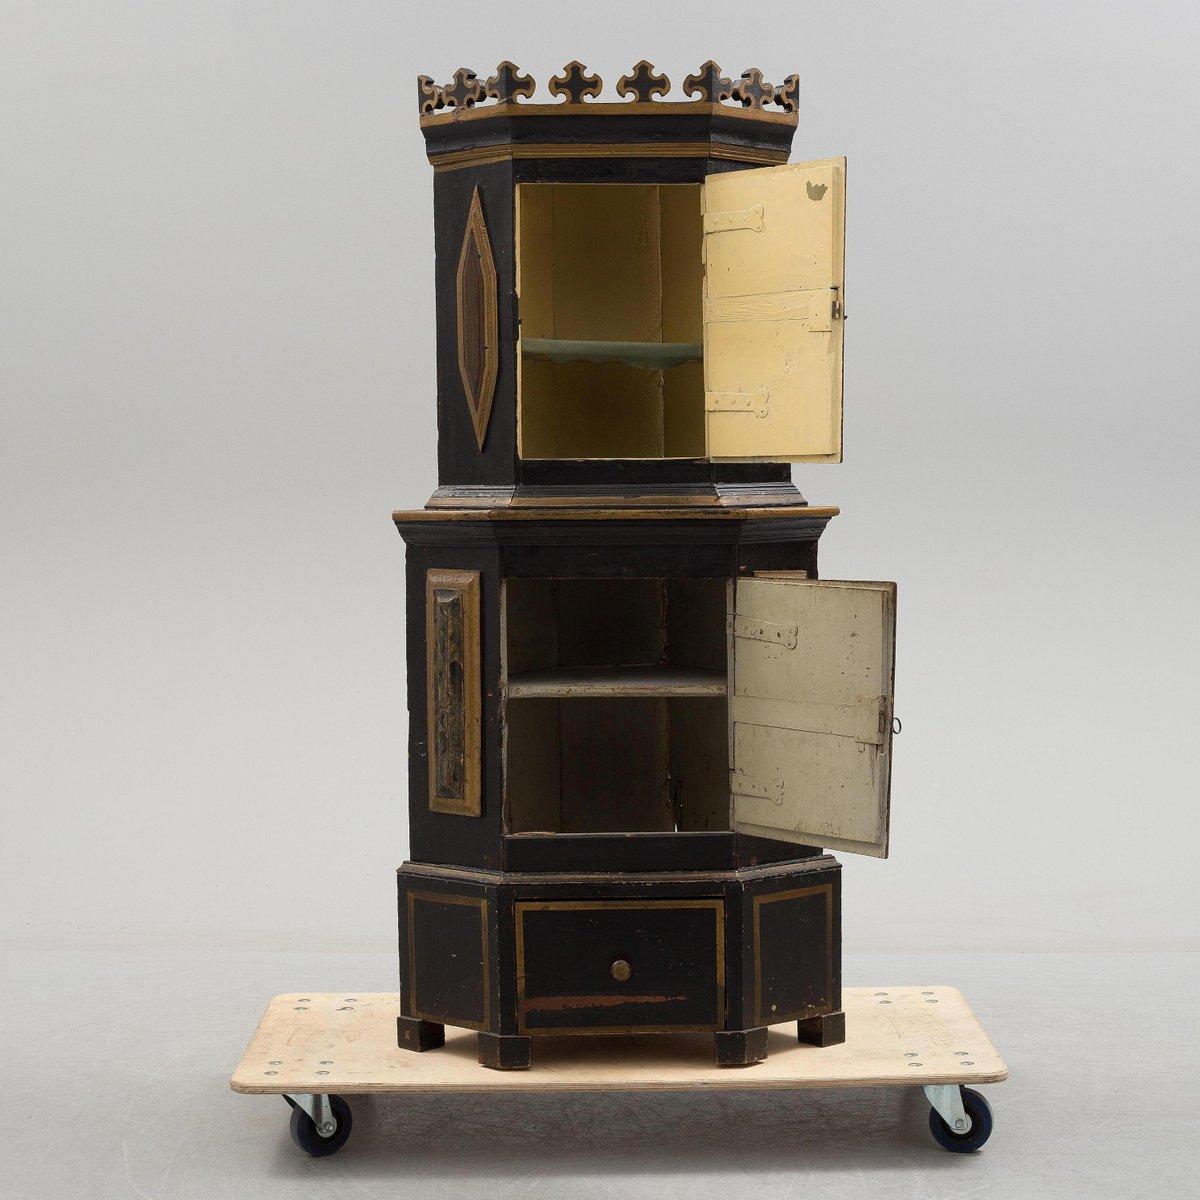 Antique Swedish Corner Cupboard - Antique Swedish Corner Cupboard For Sale At Pamono